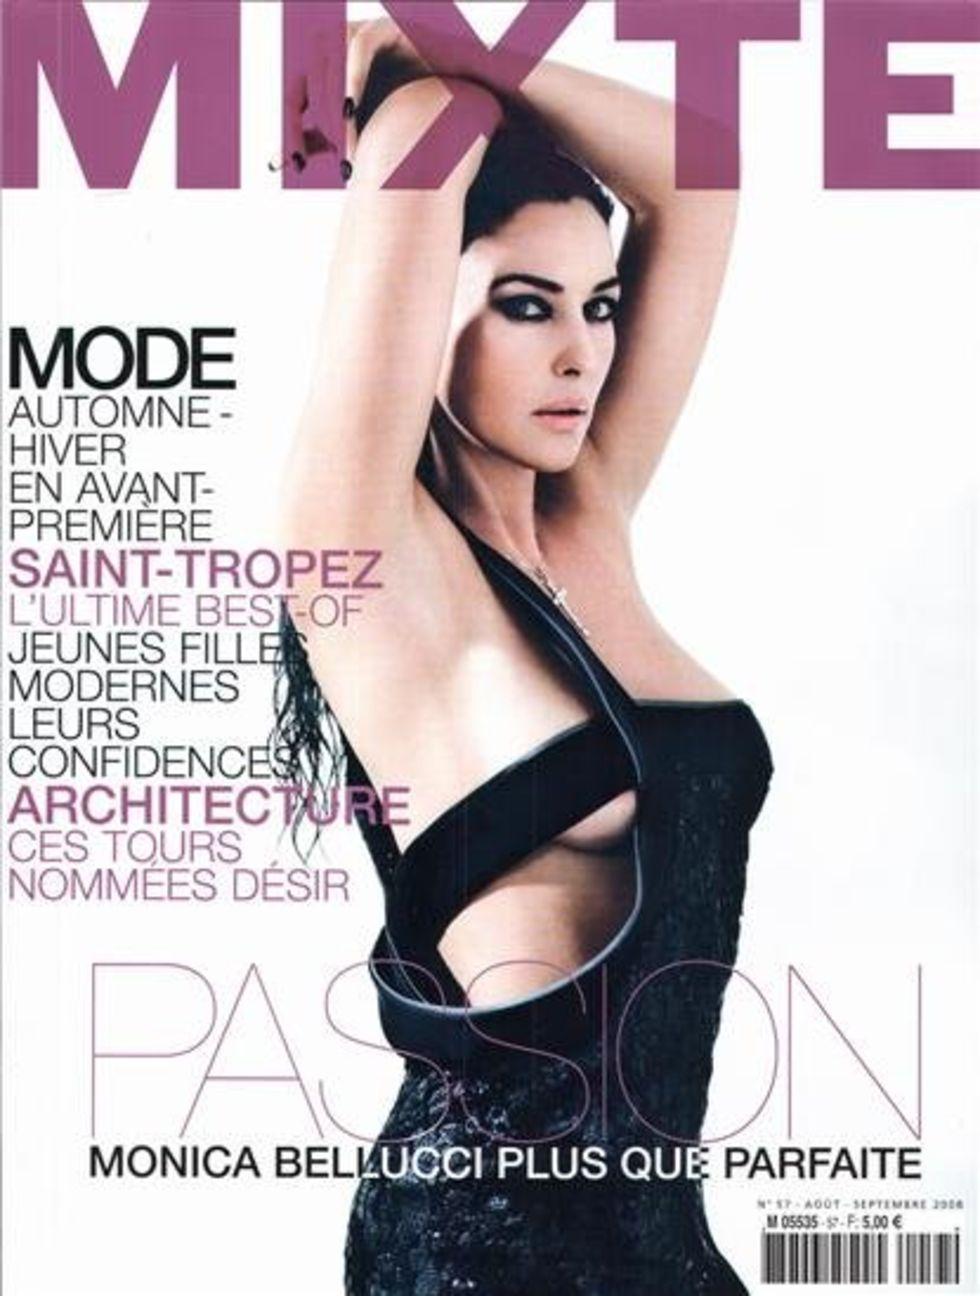 monica-bellucci-mixte-magazine-september-2008-lq-01